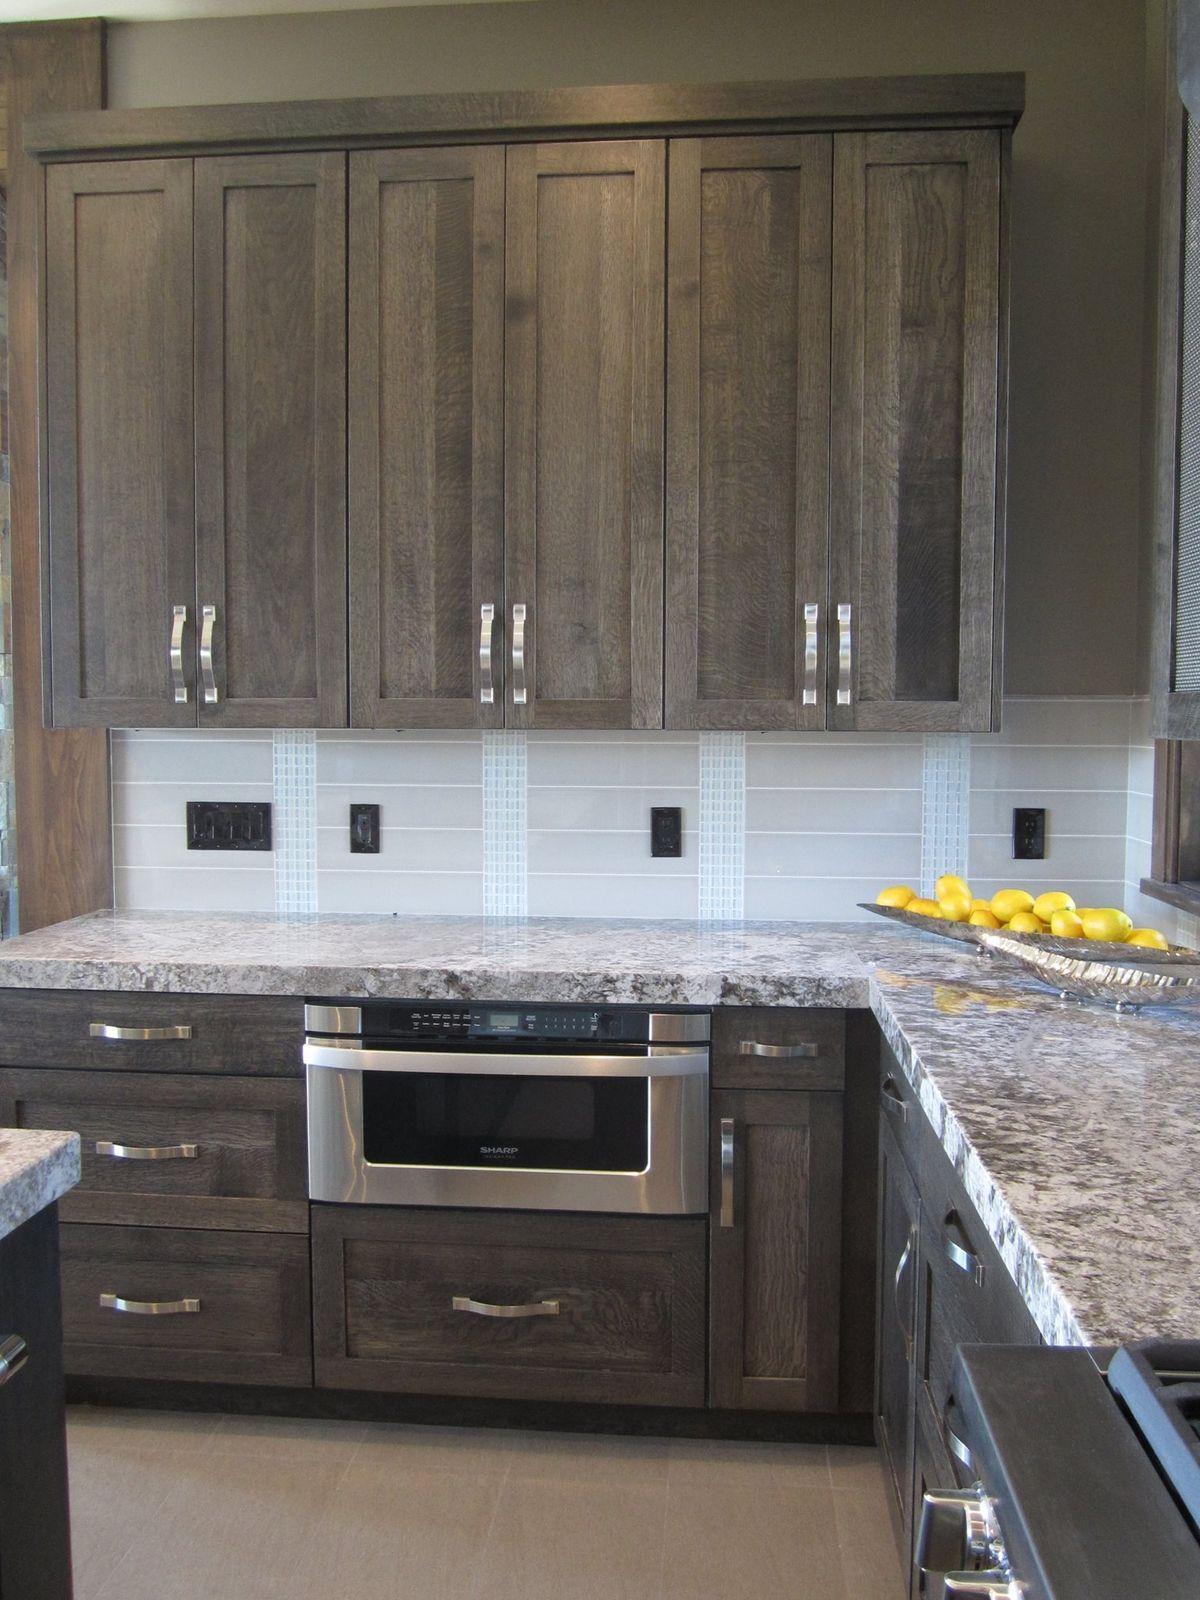 Pin by dre kawka on kitchens pinterest kitchen cabinets kitchen